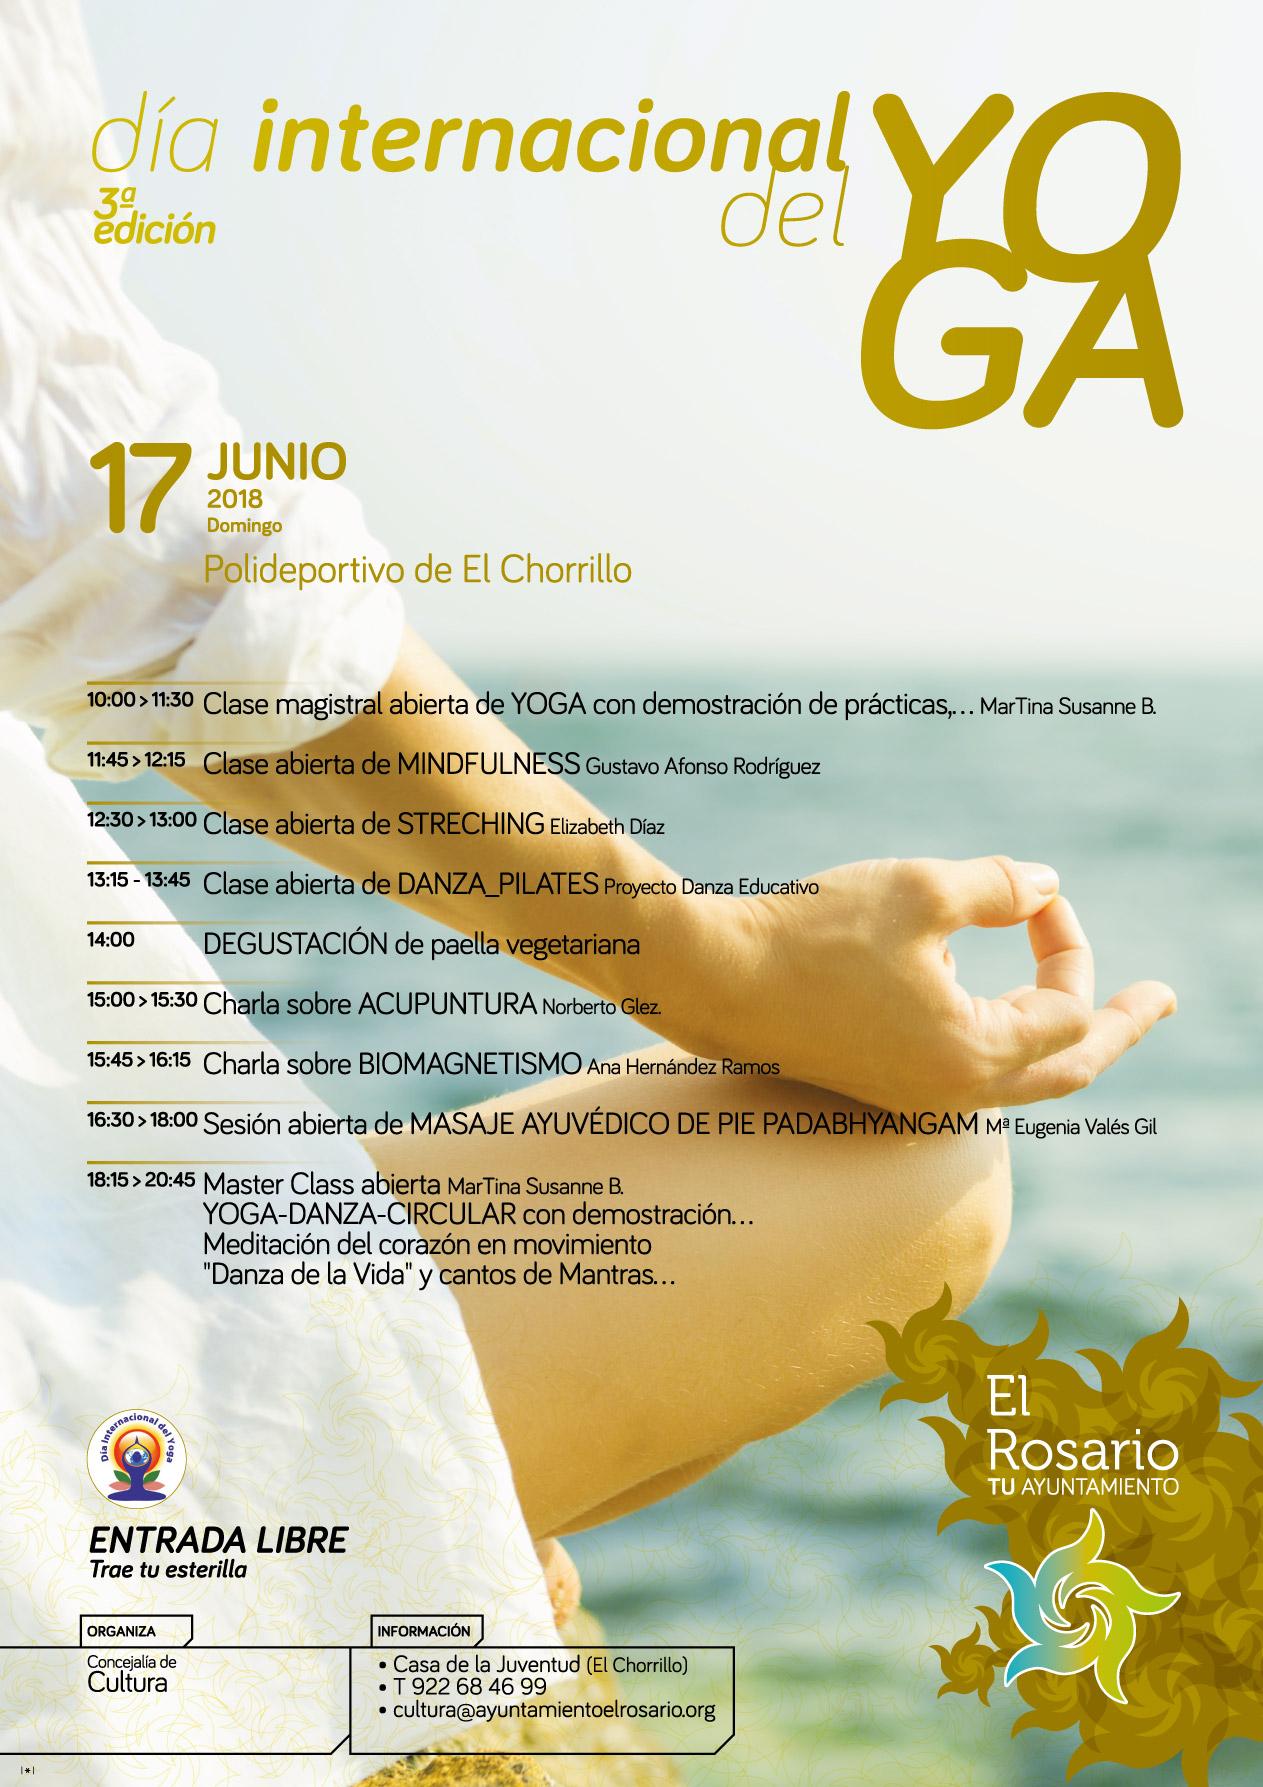 DIA_INTERNACIONAL_YOGA-20180617-CARTEL_A3-20180517-01af-redes